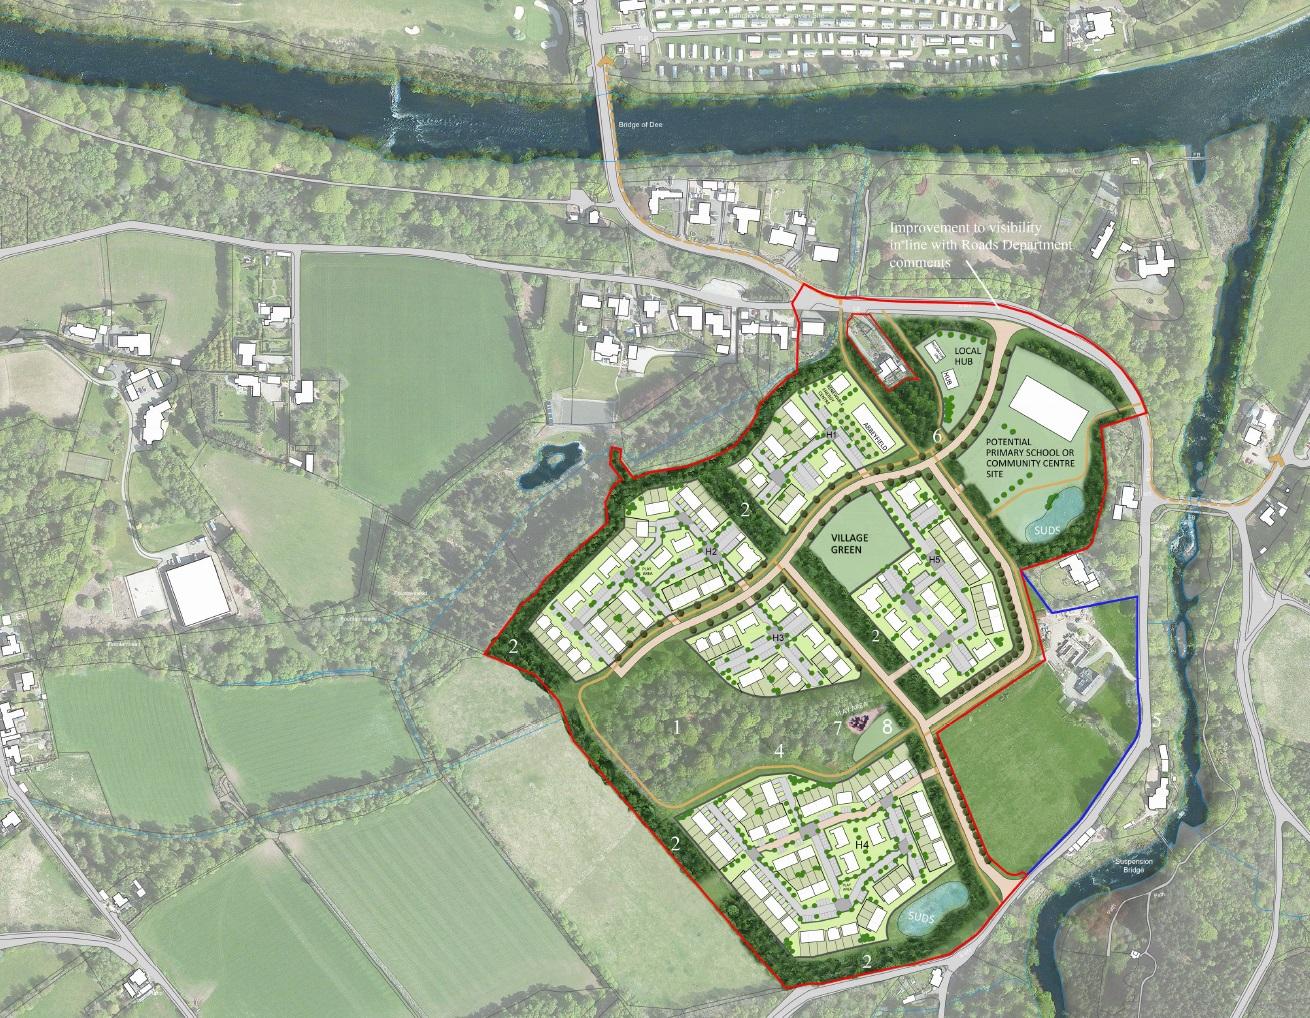 Image of 300 home masterplan